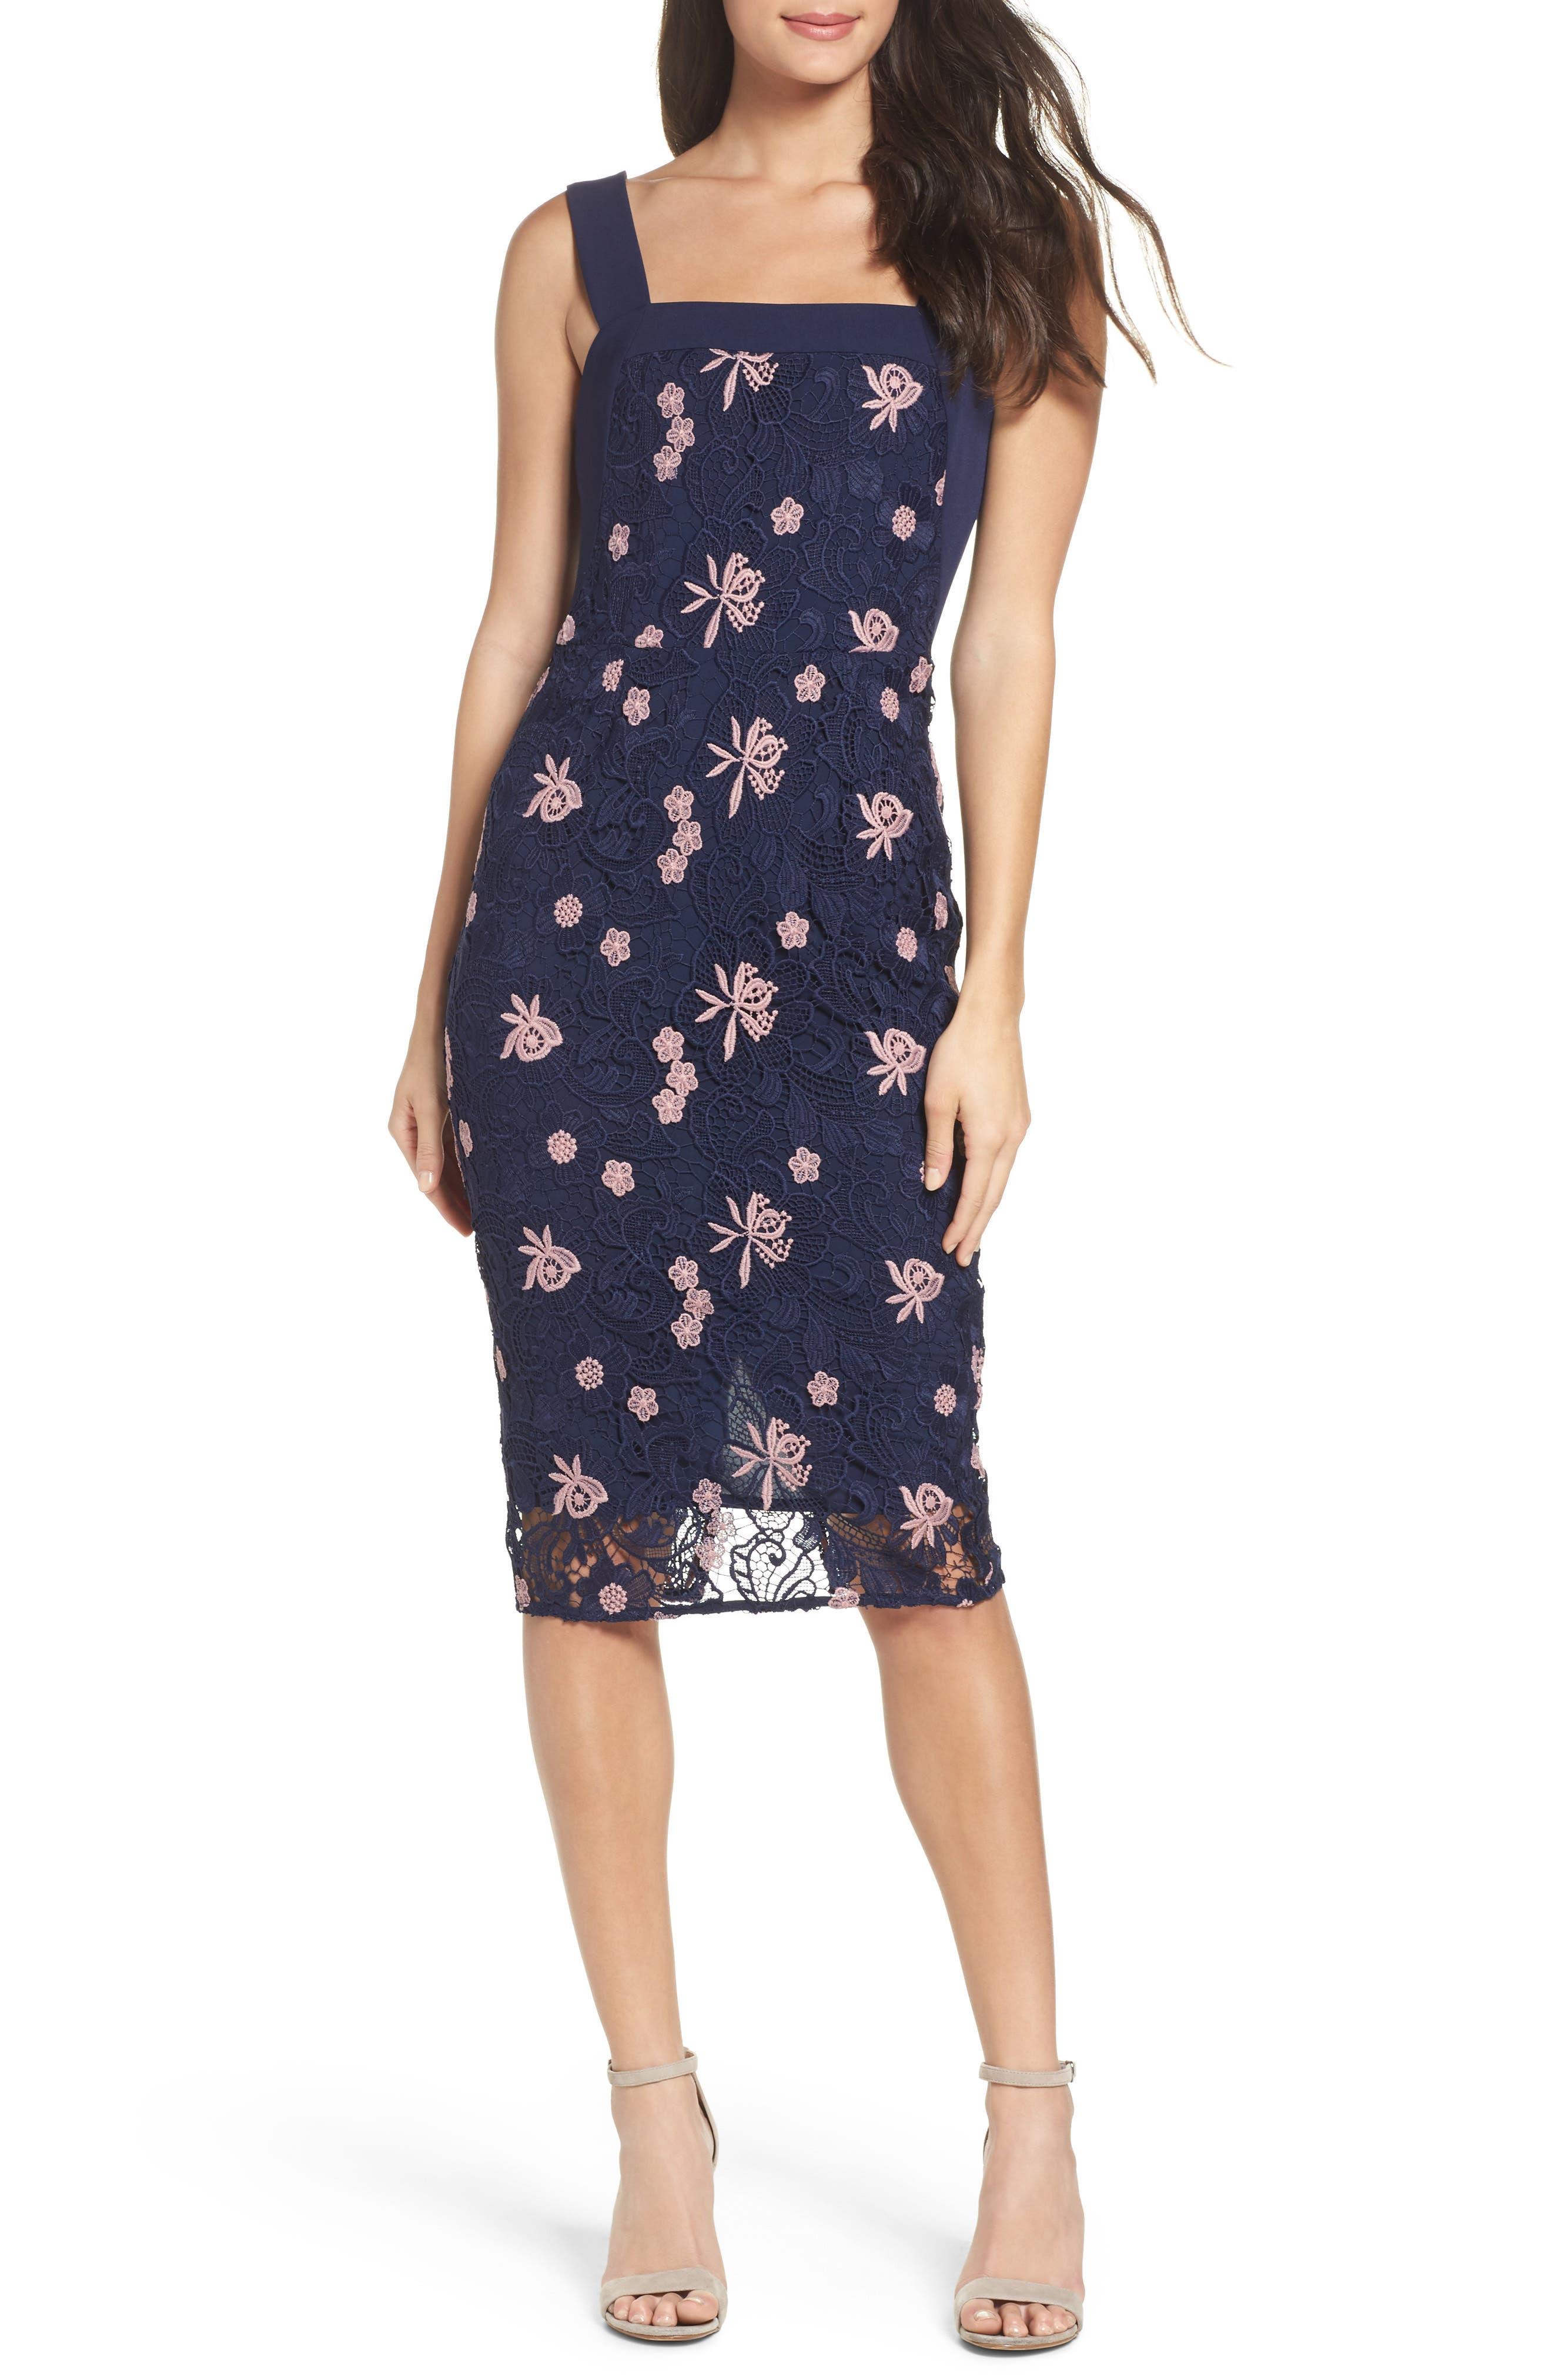 Alternate Image 1 Selected - Cooper St Botanic Bloom Sheath Dress